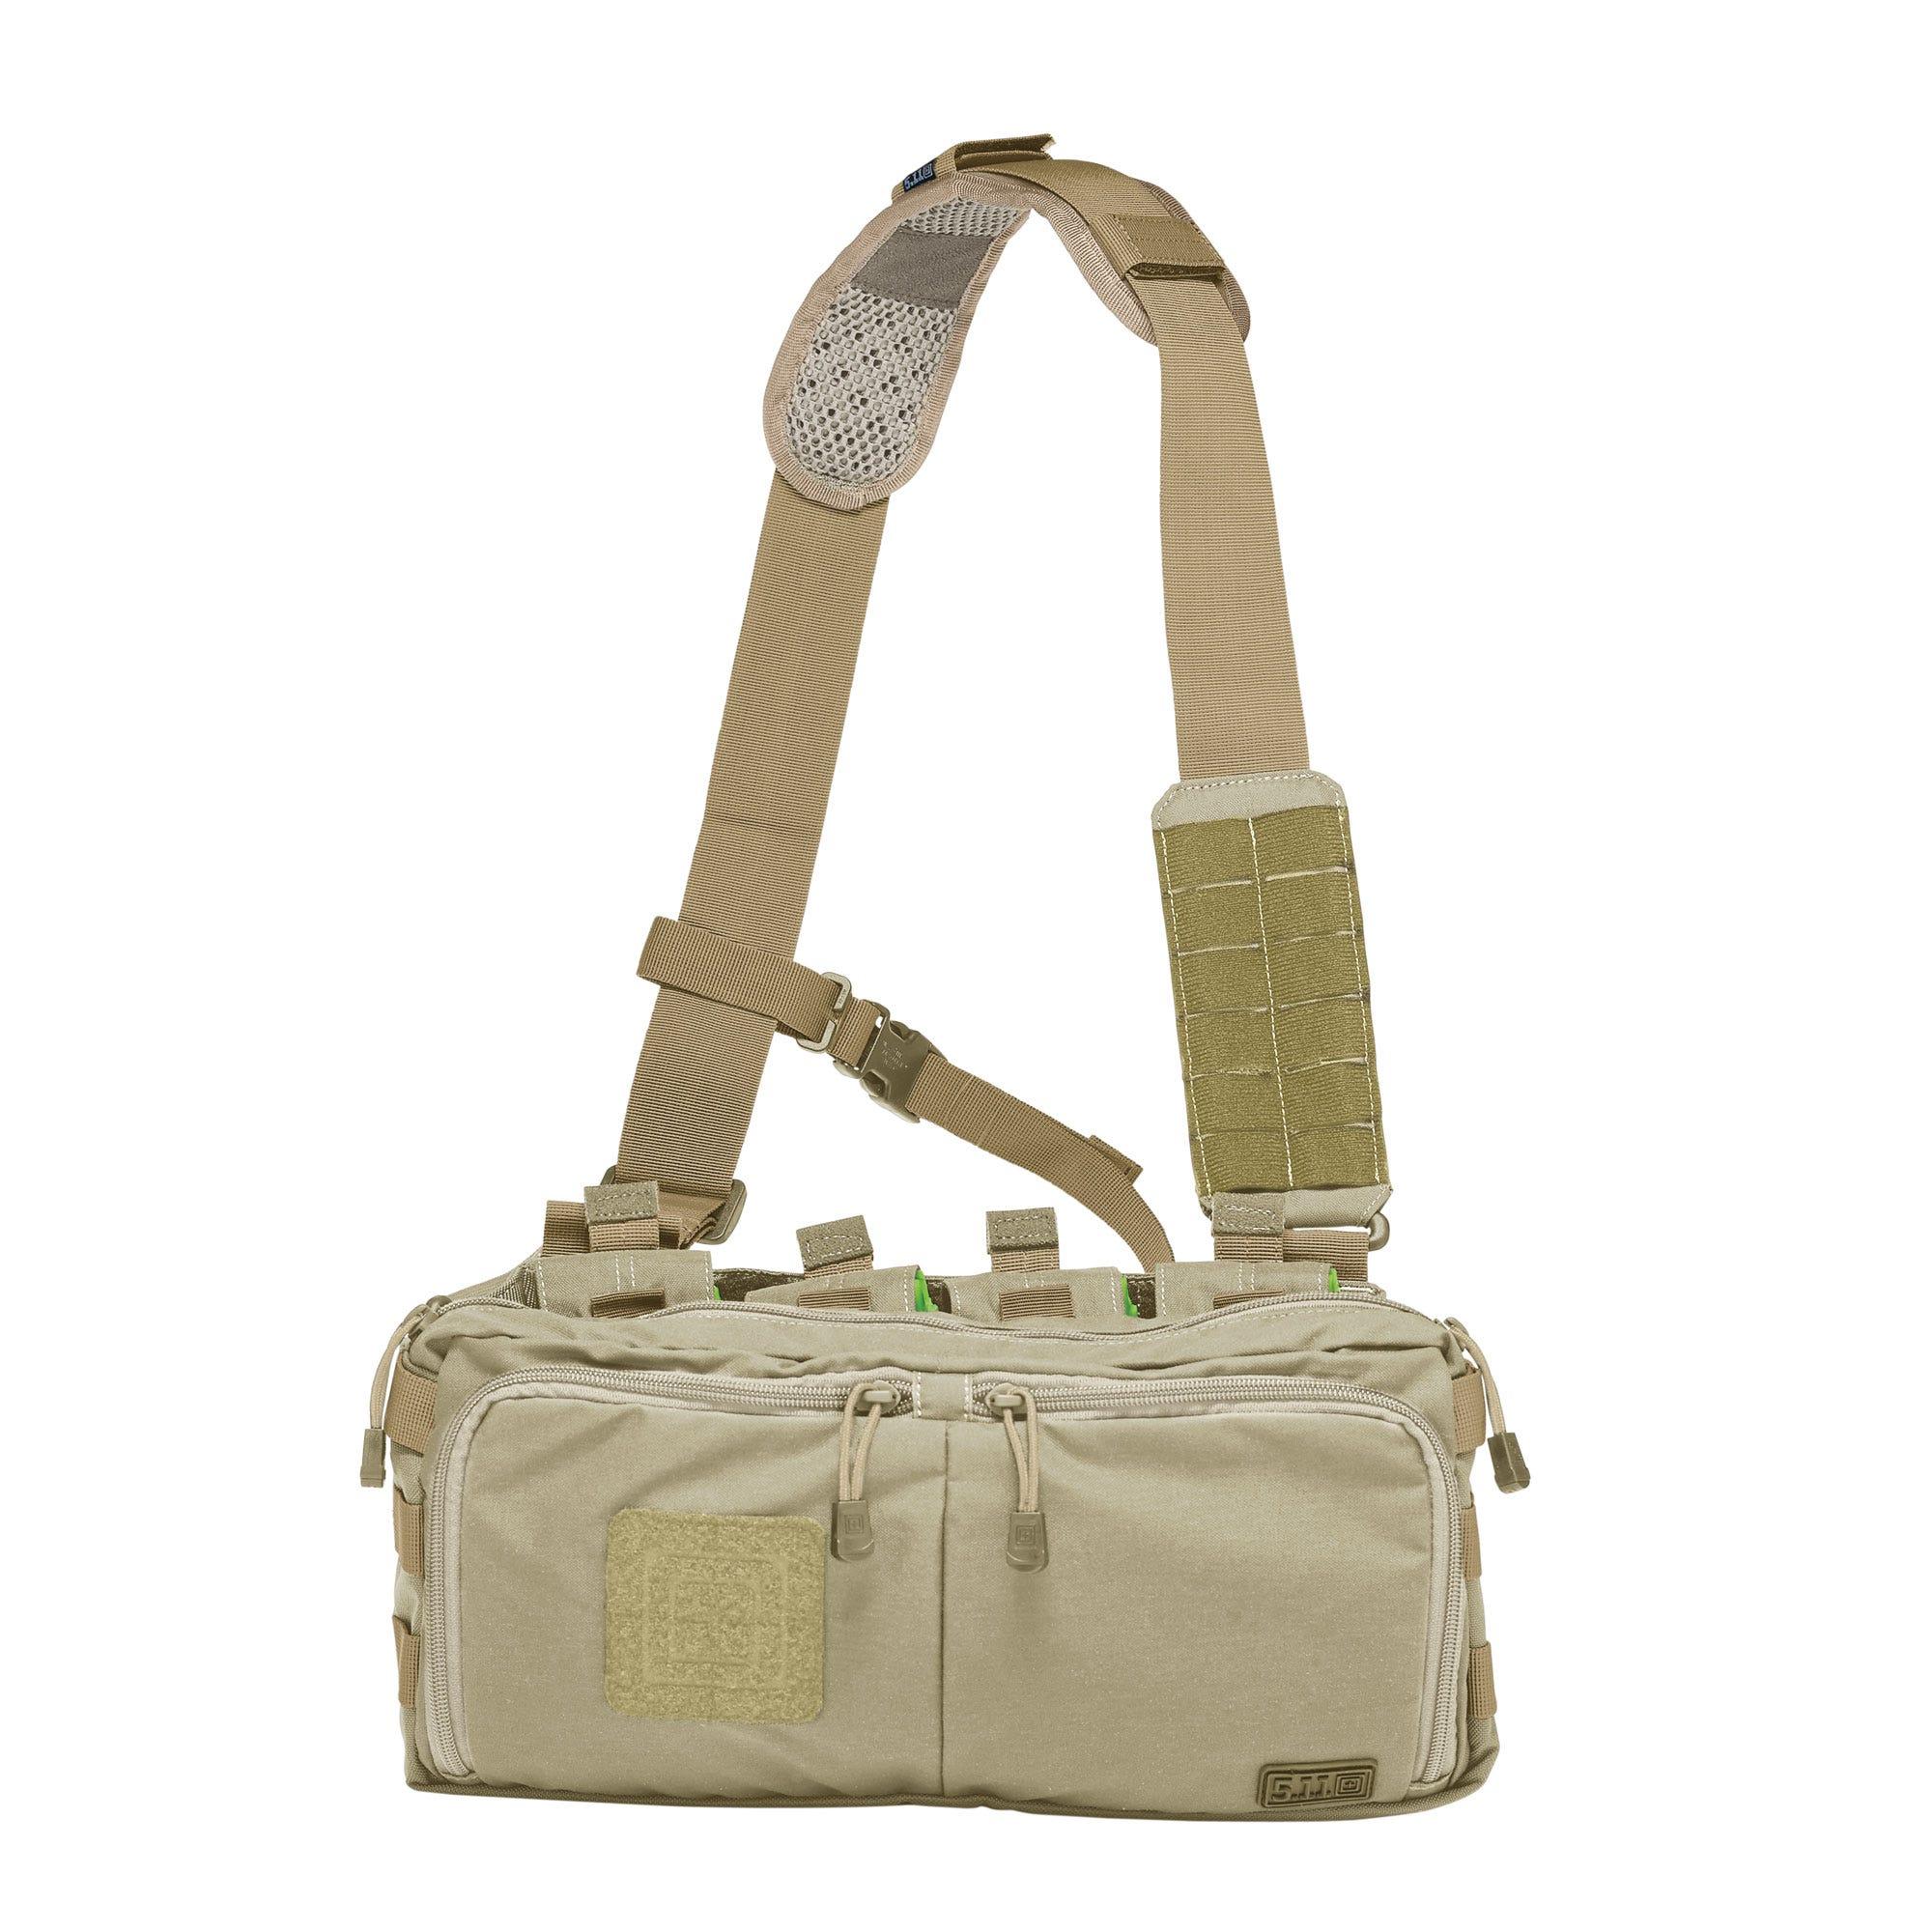 5.11 Tactical 4-Banger Bag (Khaki/Tan), Size 1 SZ (CCW Concealed Carry) thumbnail